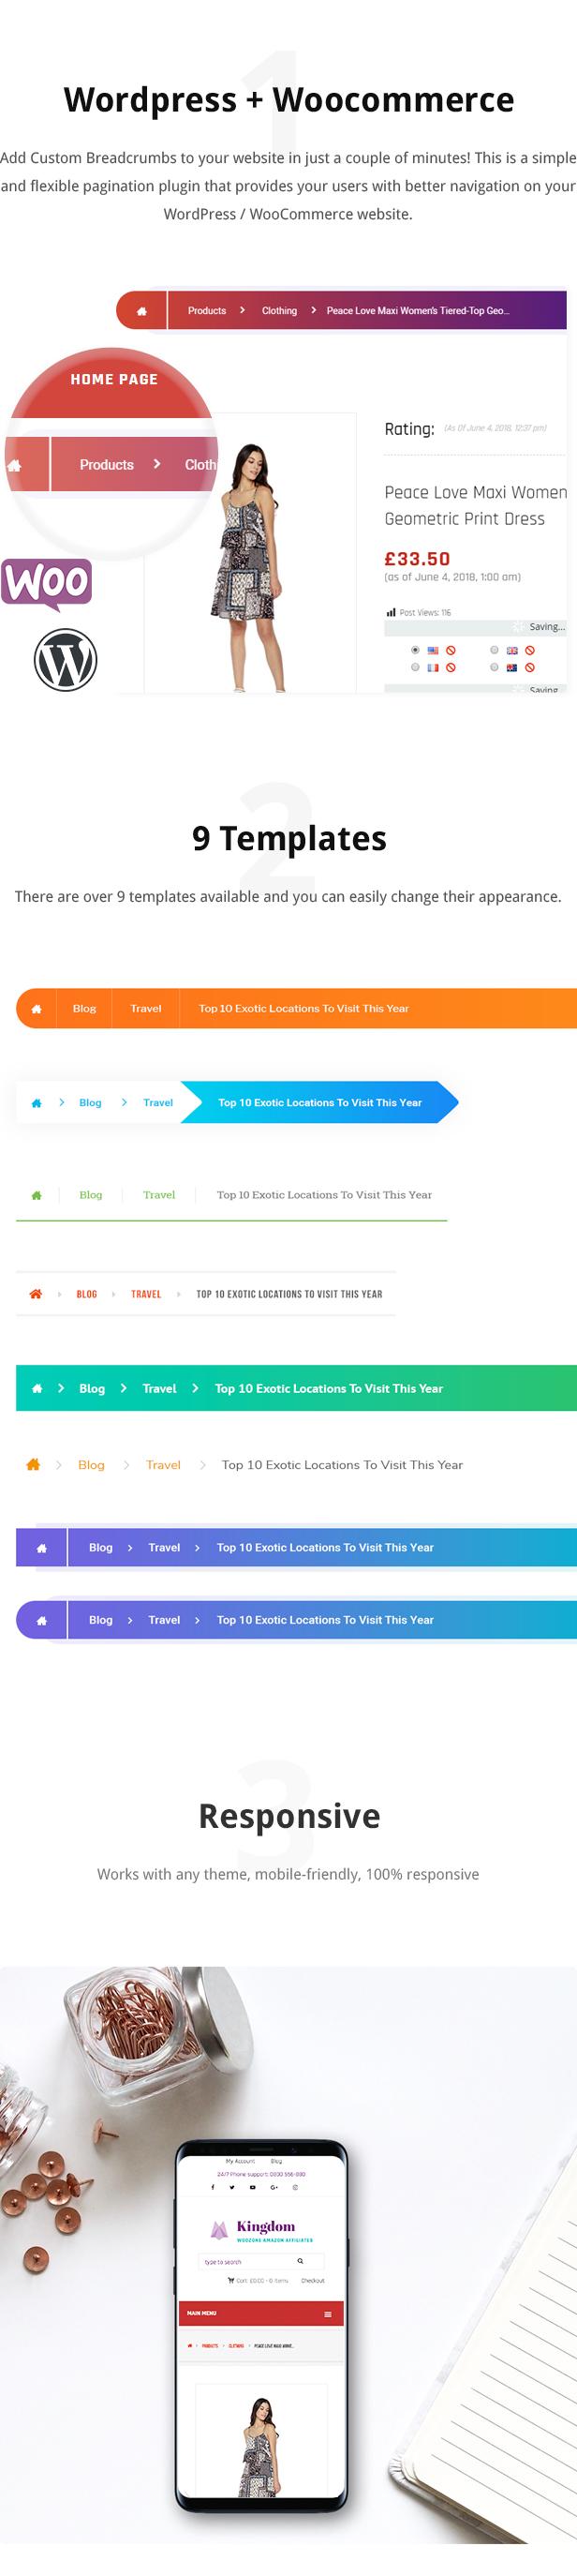 Plug-in de breadcrumbs personalizado para WordPress / WooCommerce - 1